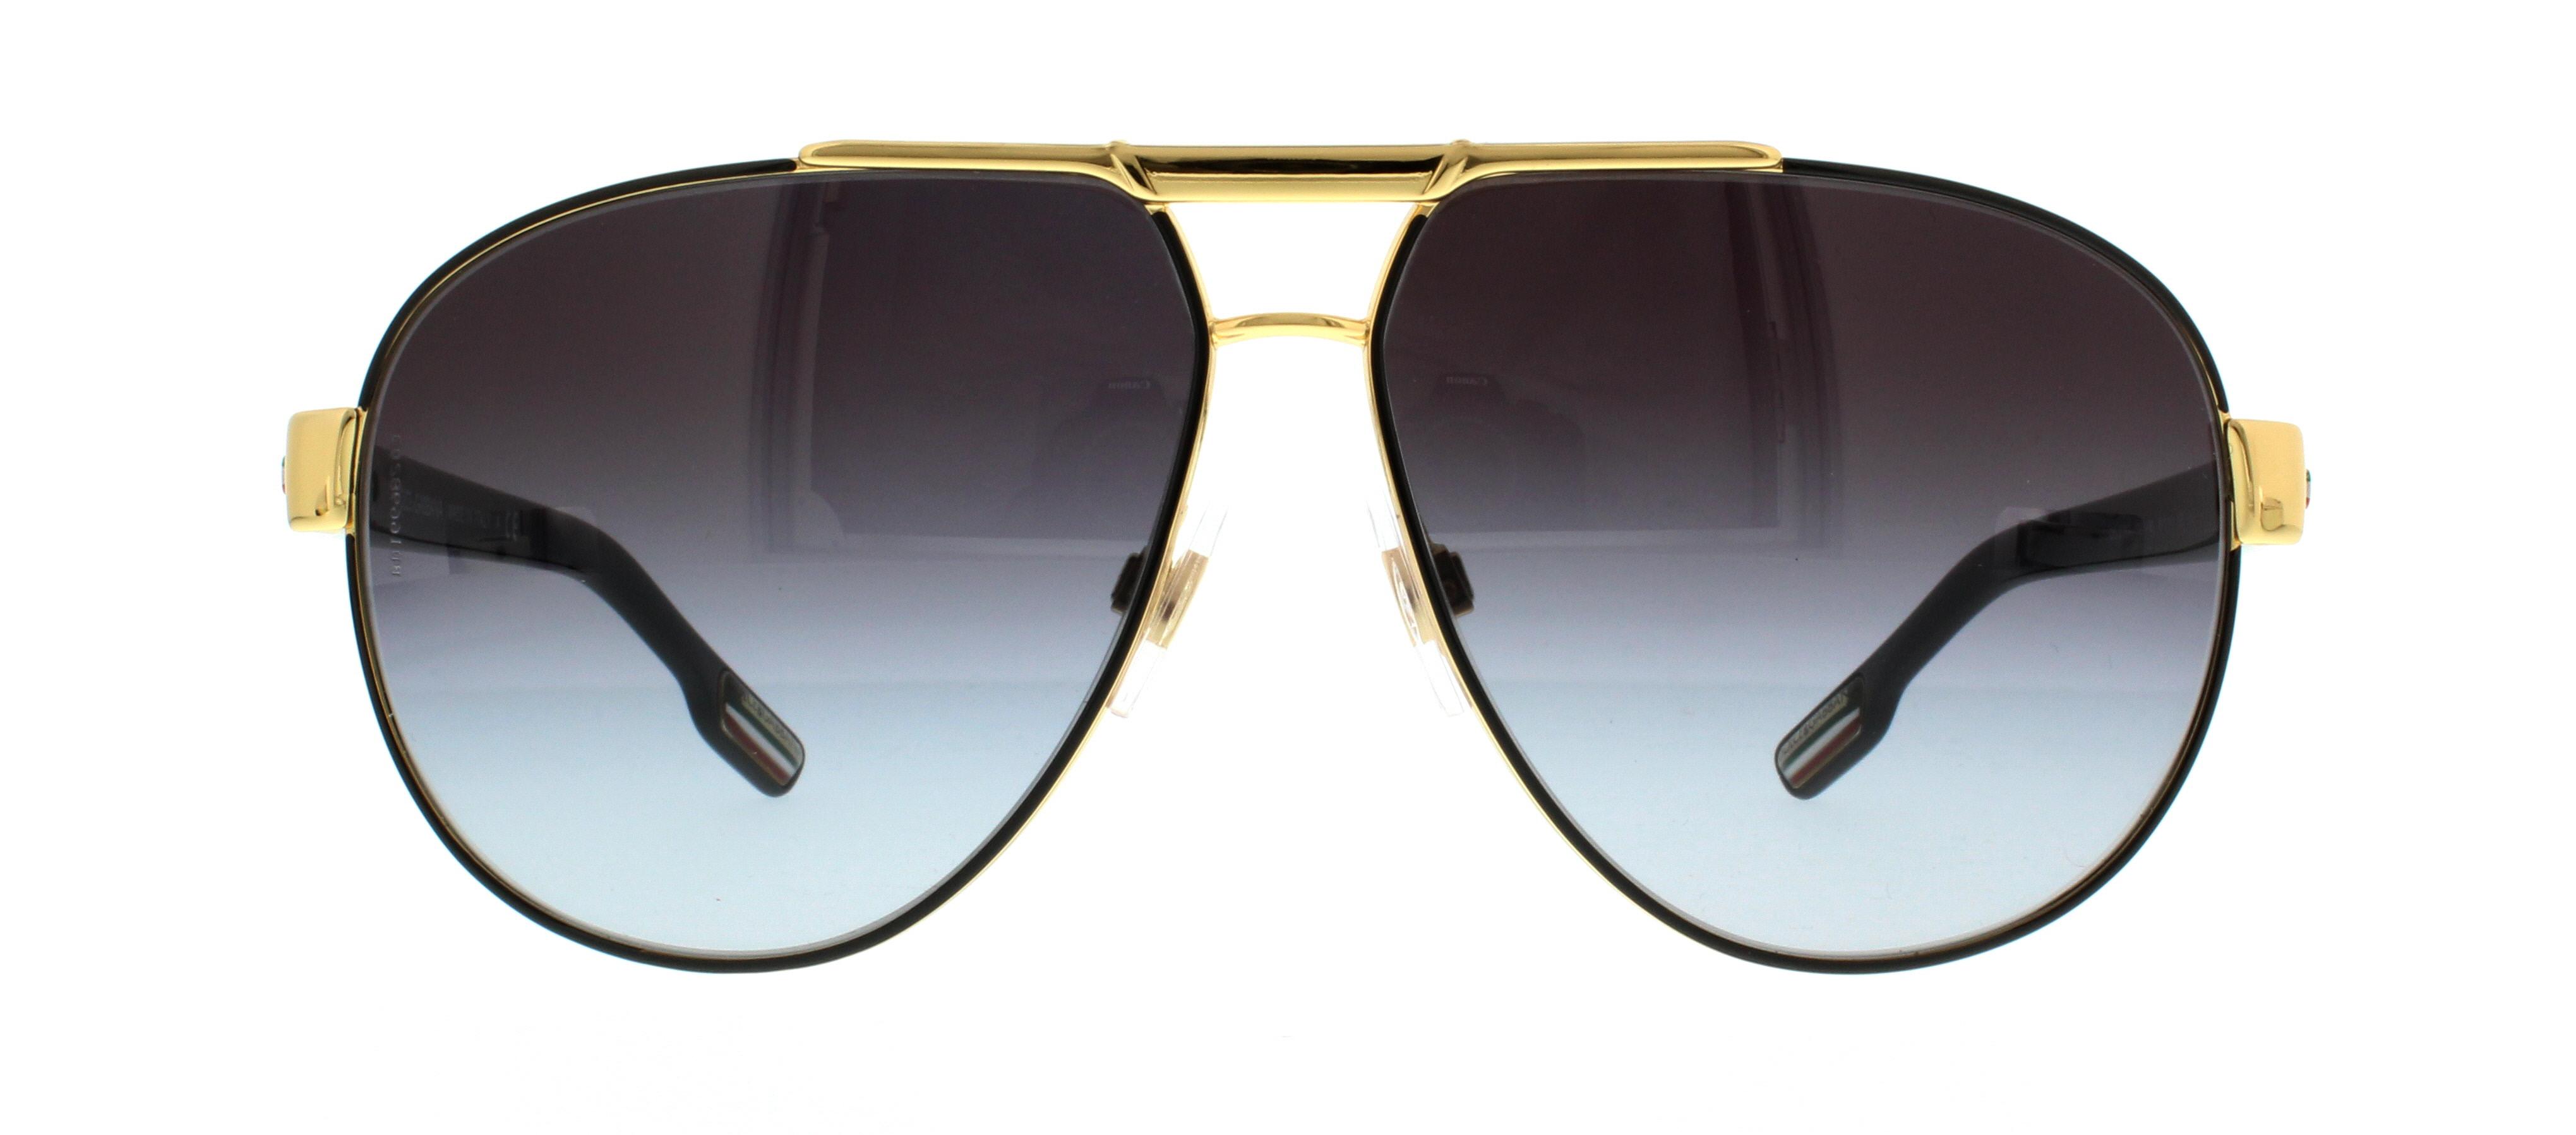 21d25e5c9bc Dolce And Gabbana Aviator Sunglasses Ebay